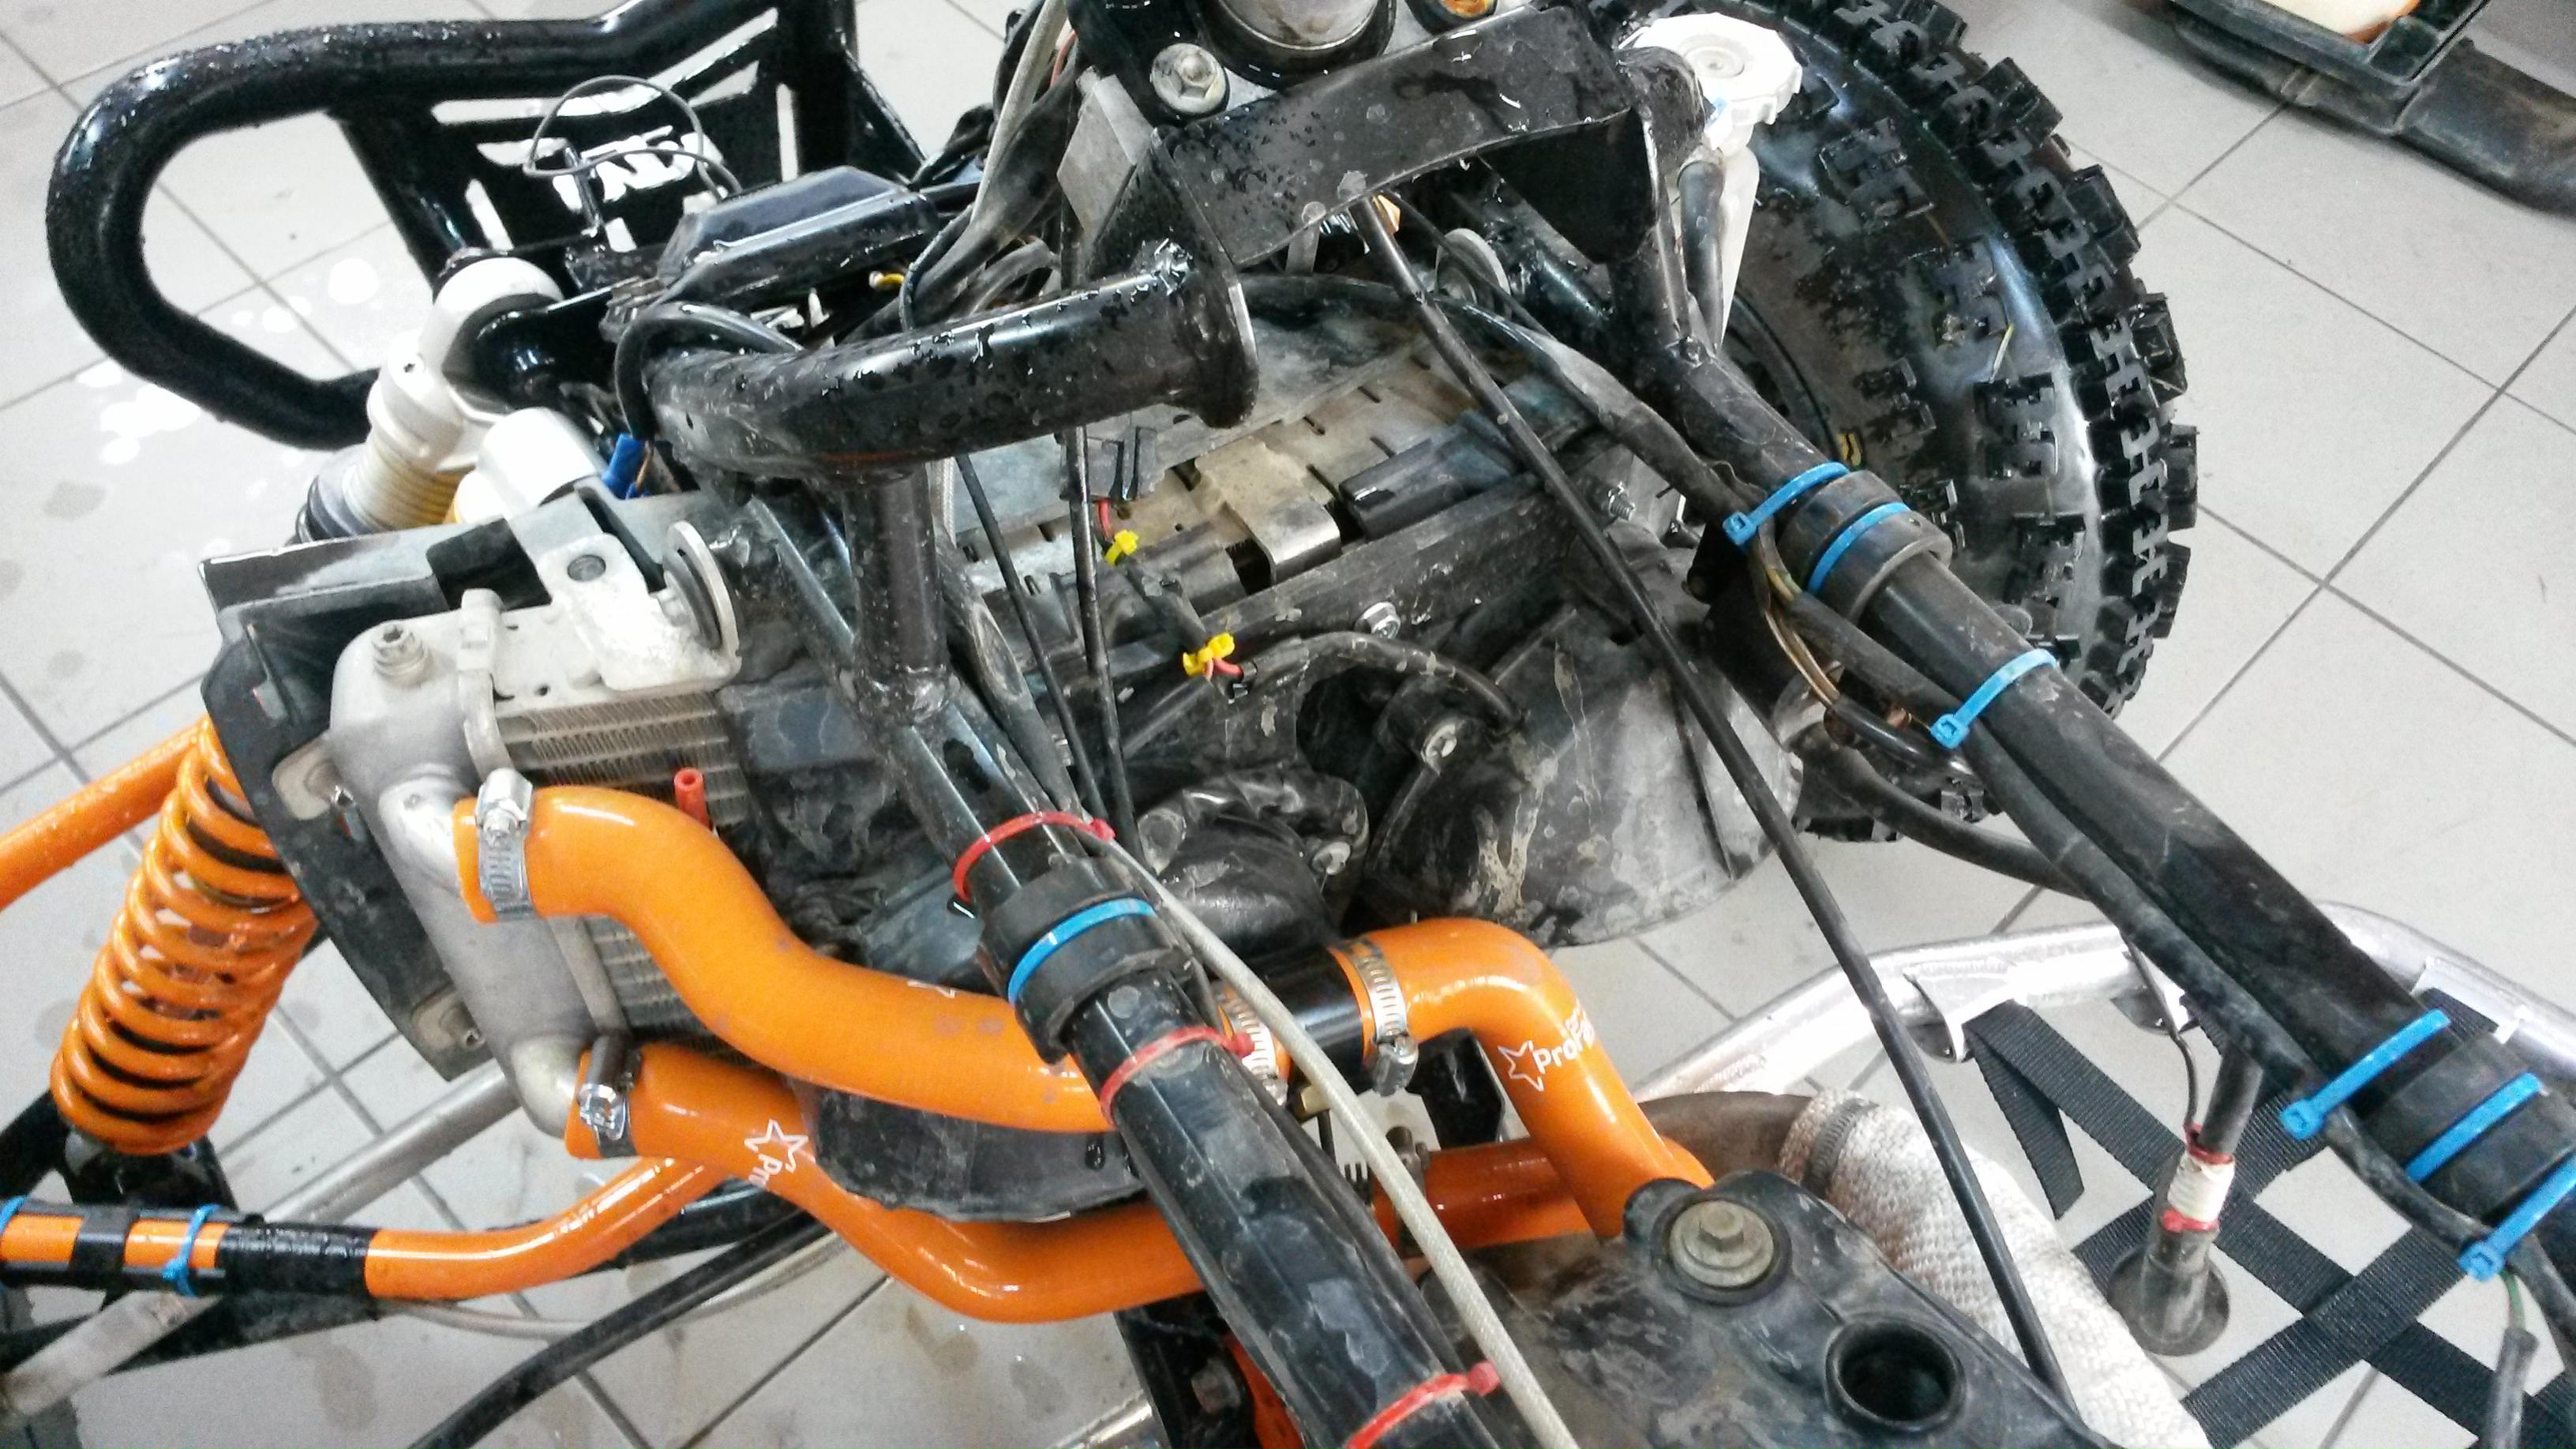 Dual fan setup, need pics-20130912_111325.jpg